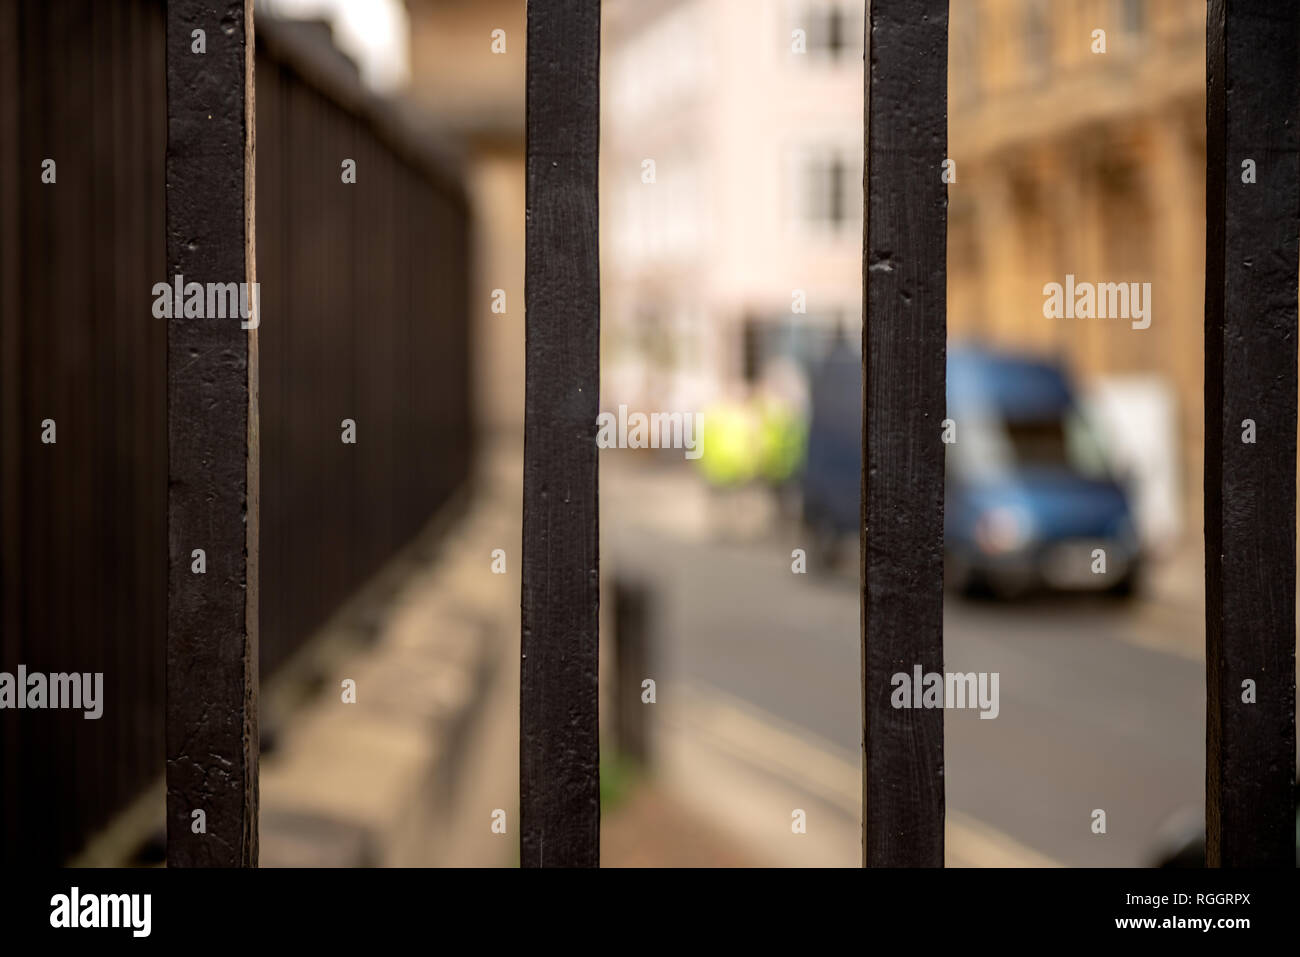 Metal security bars close up closeup close-up.. Out of focus policemen in hi vis vests and blue van. Criminal crime concept. - Stock Image